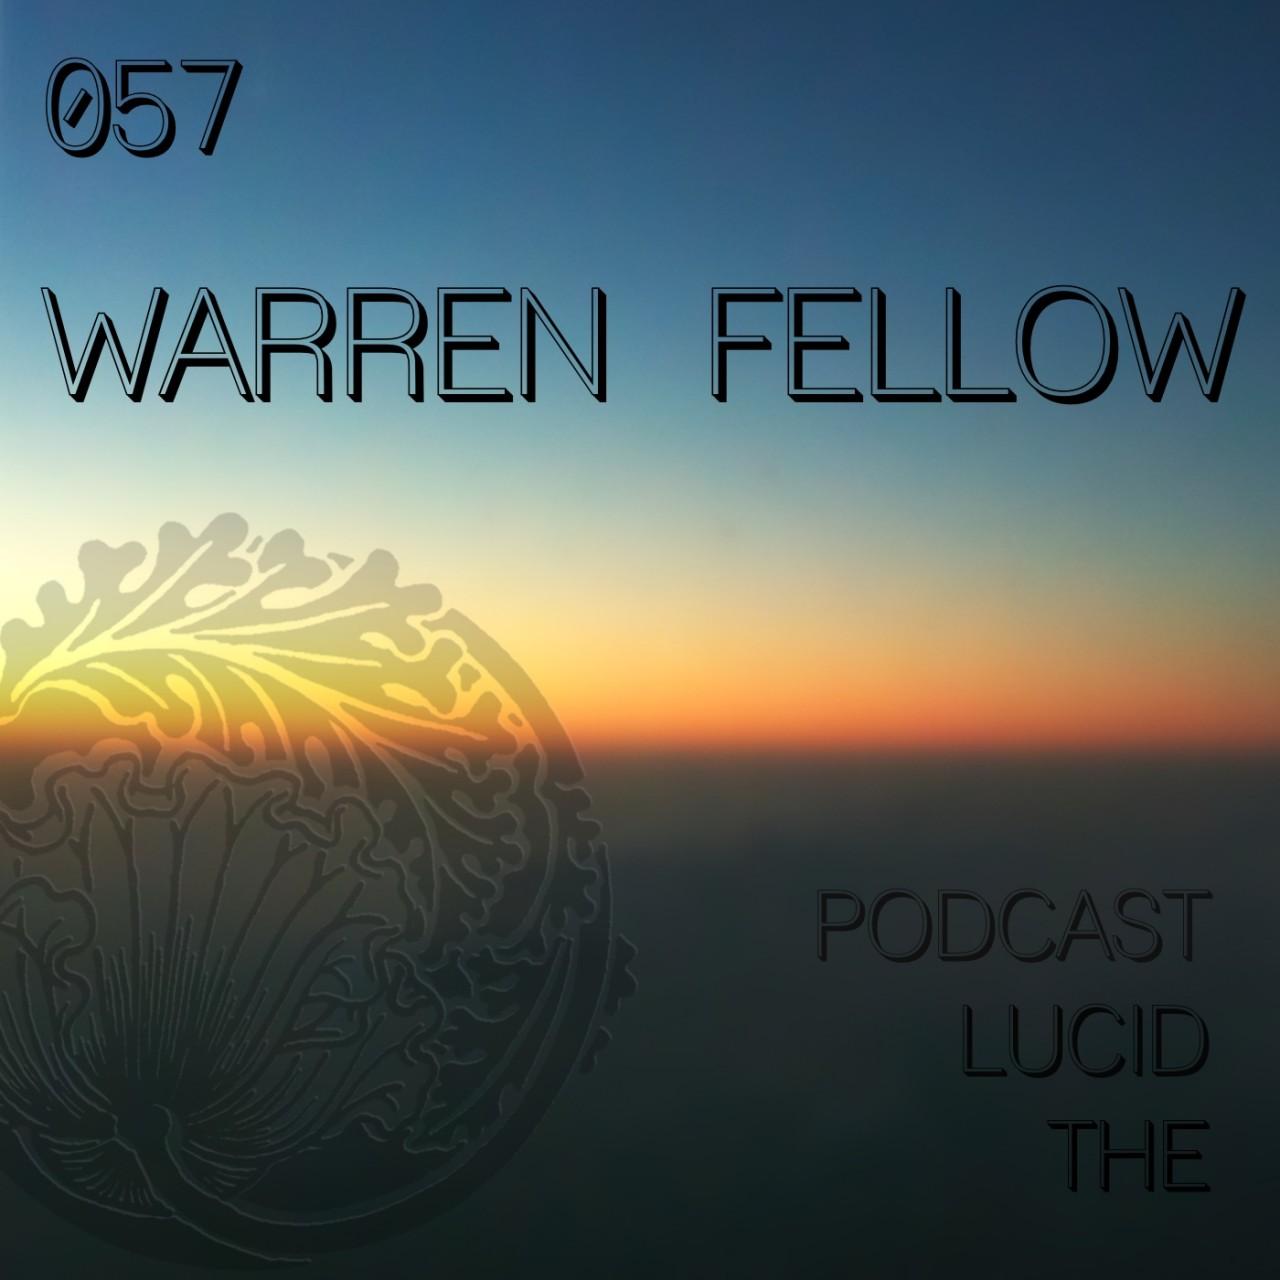 The Lucid Podcast 057 Warren Fellow